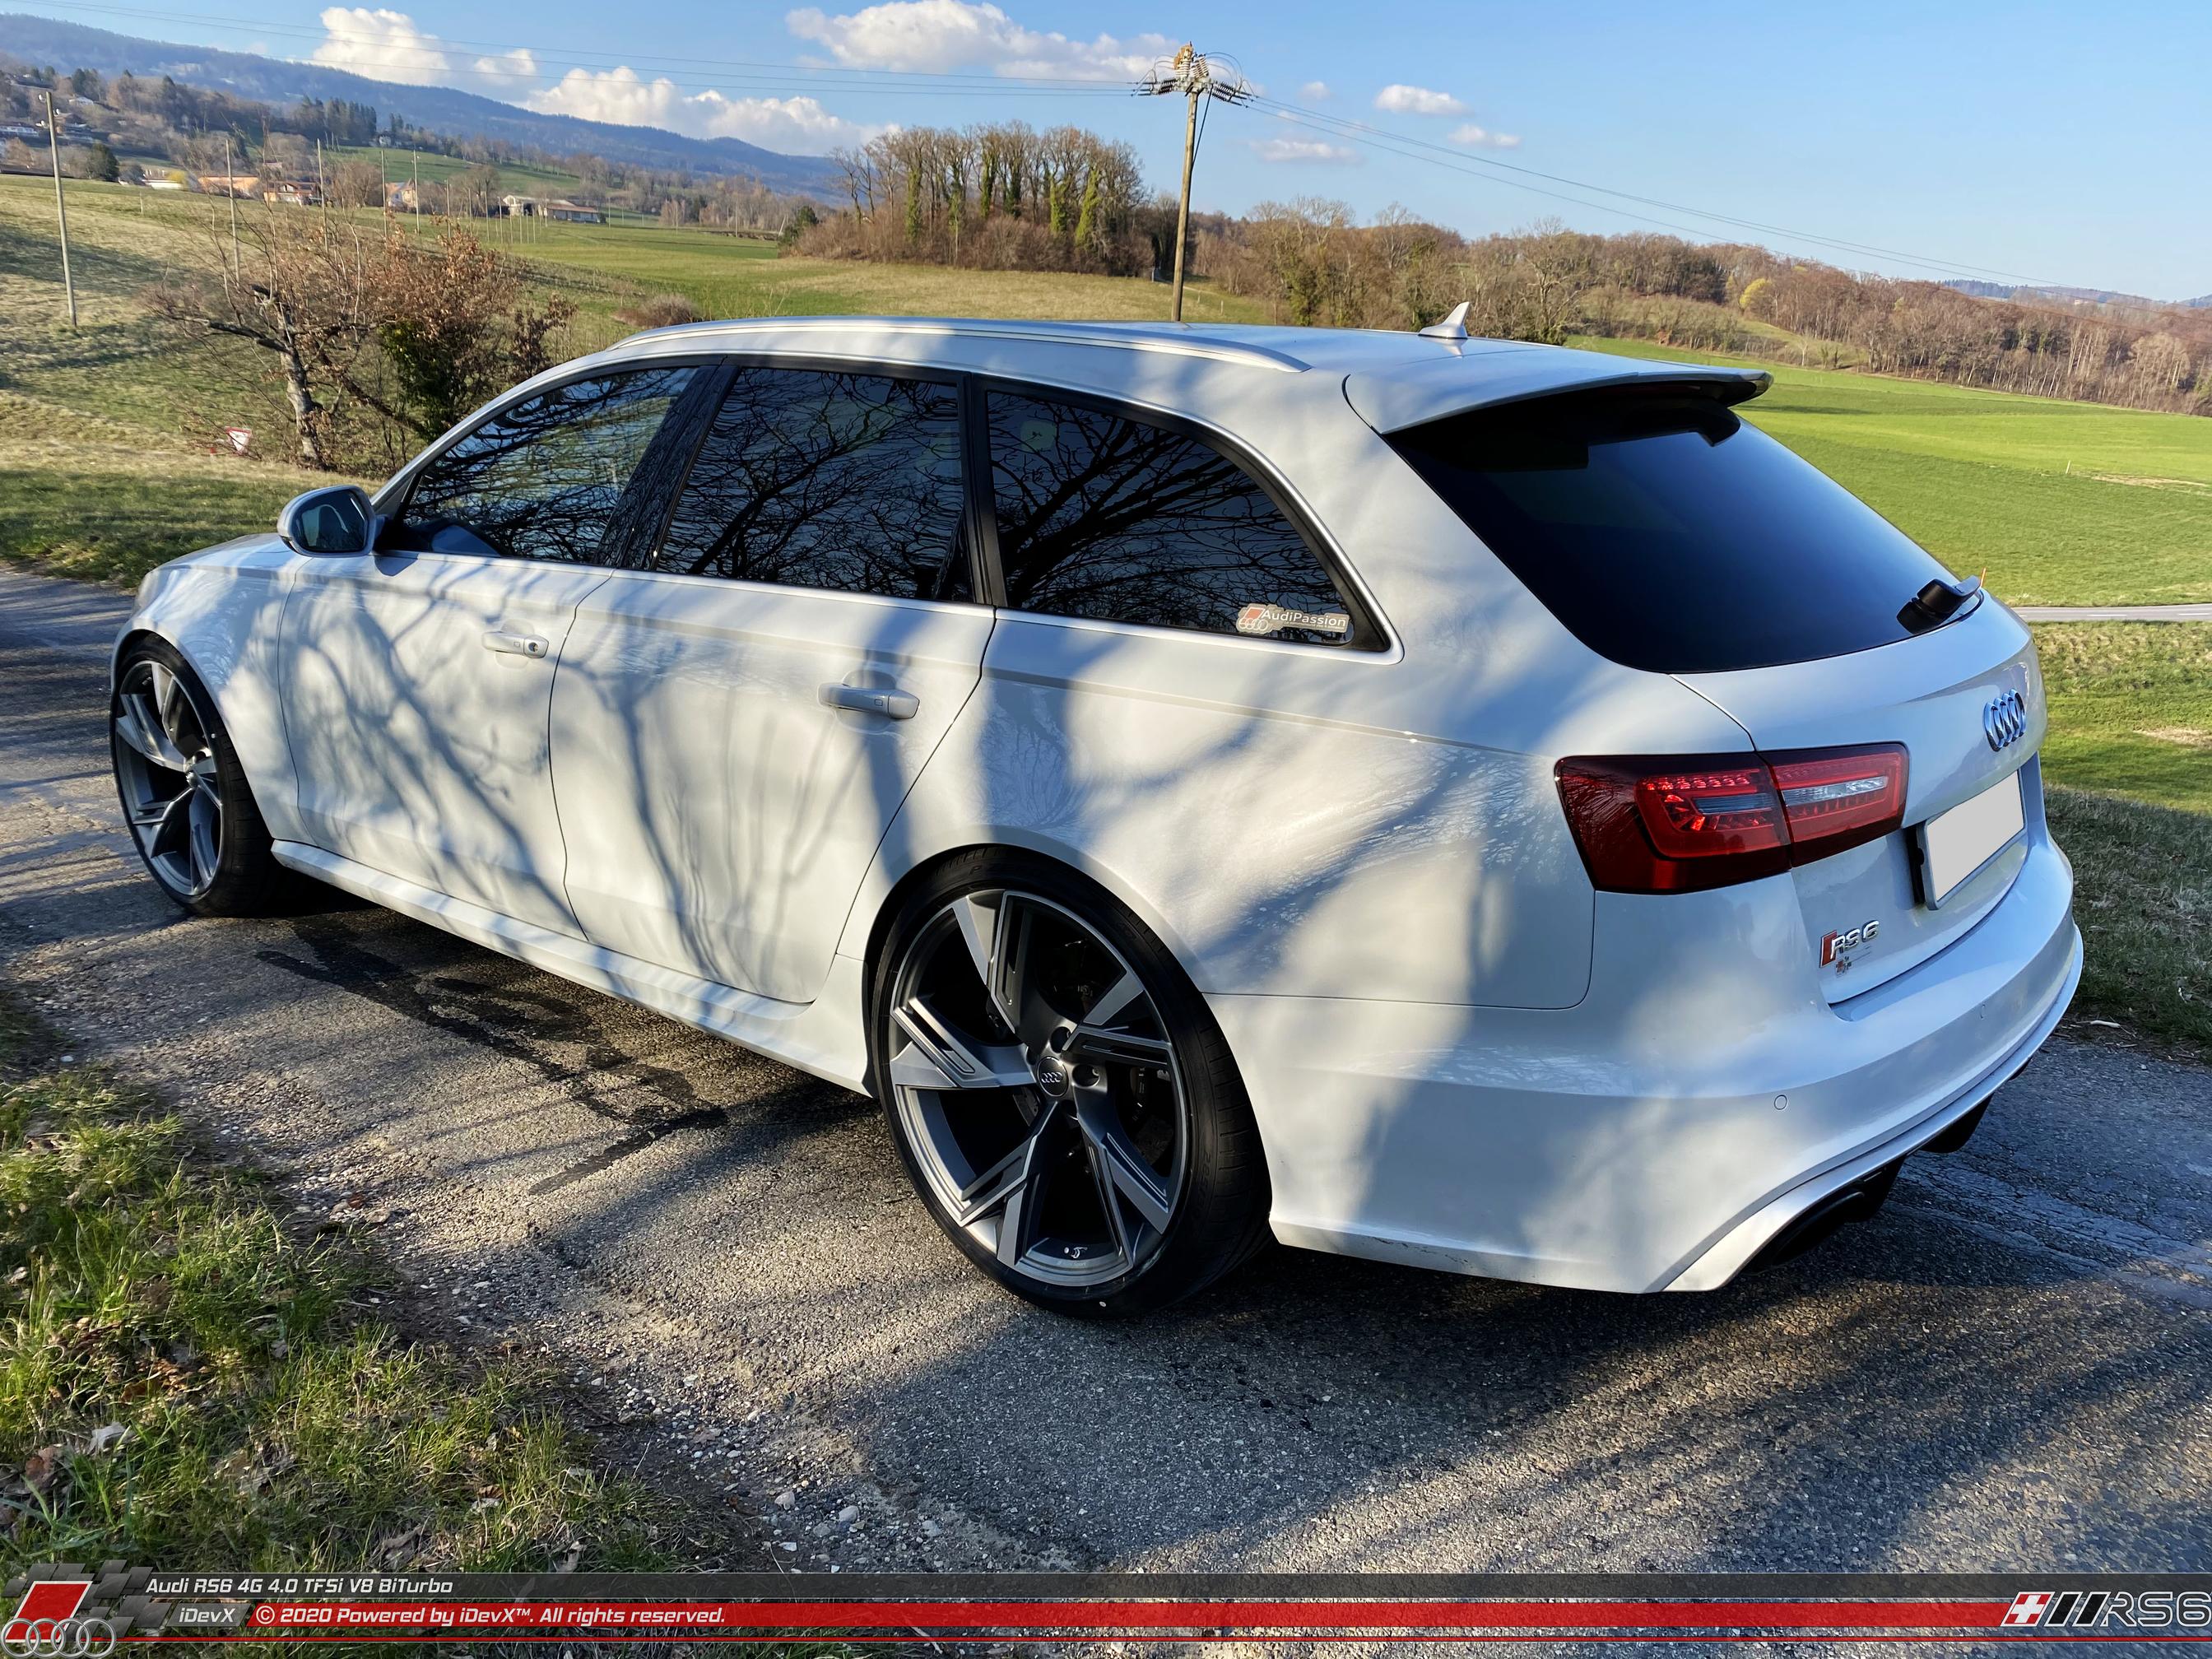 18.03.2020_Audi-RS6_iDevX_009.png